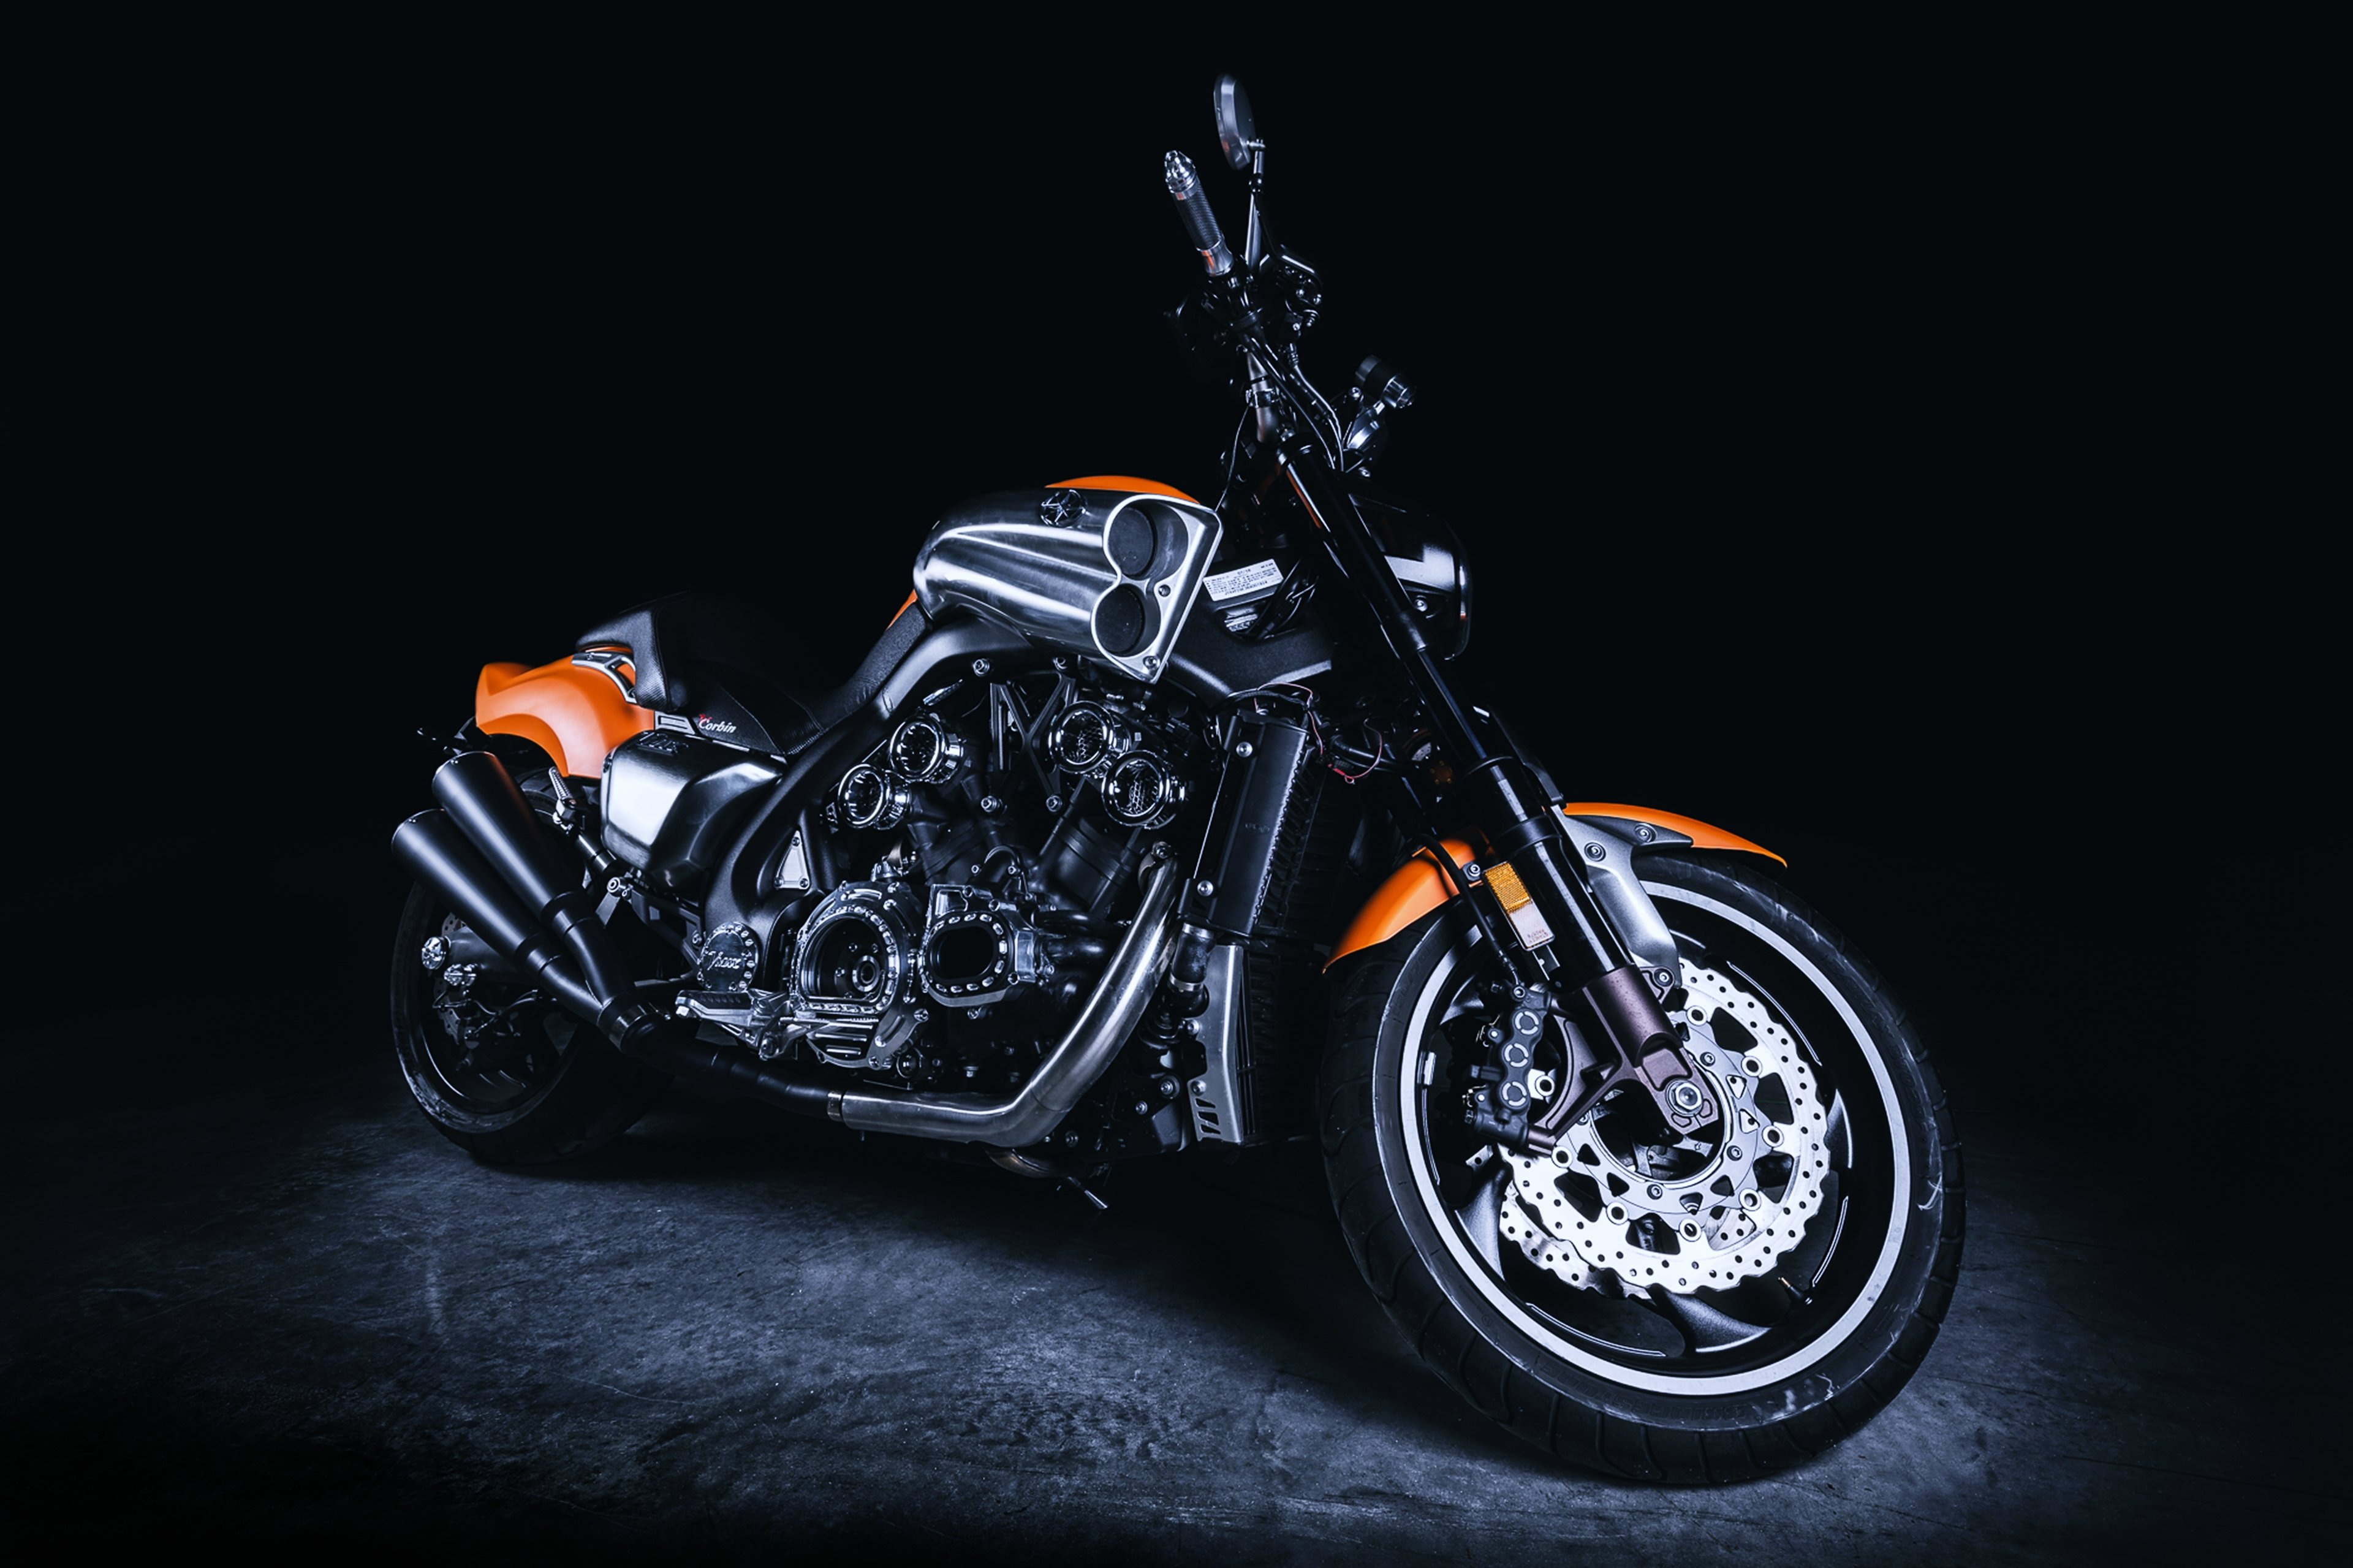 Motorcycles speed motors race bike vmax harley davidson 3840x2559